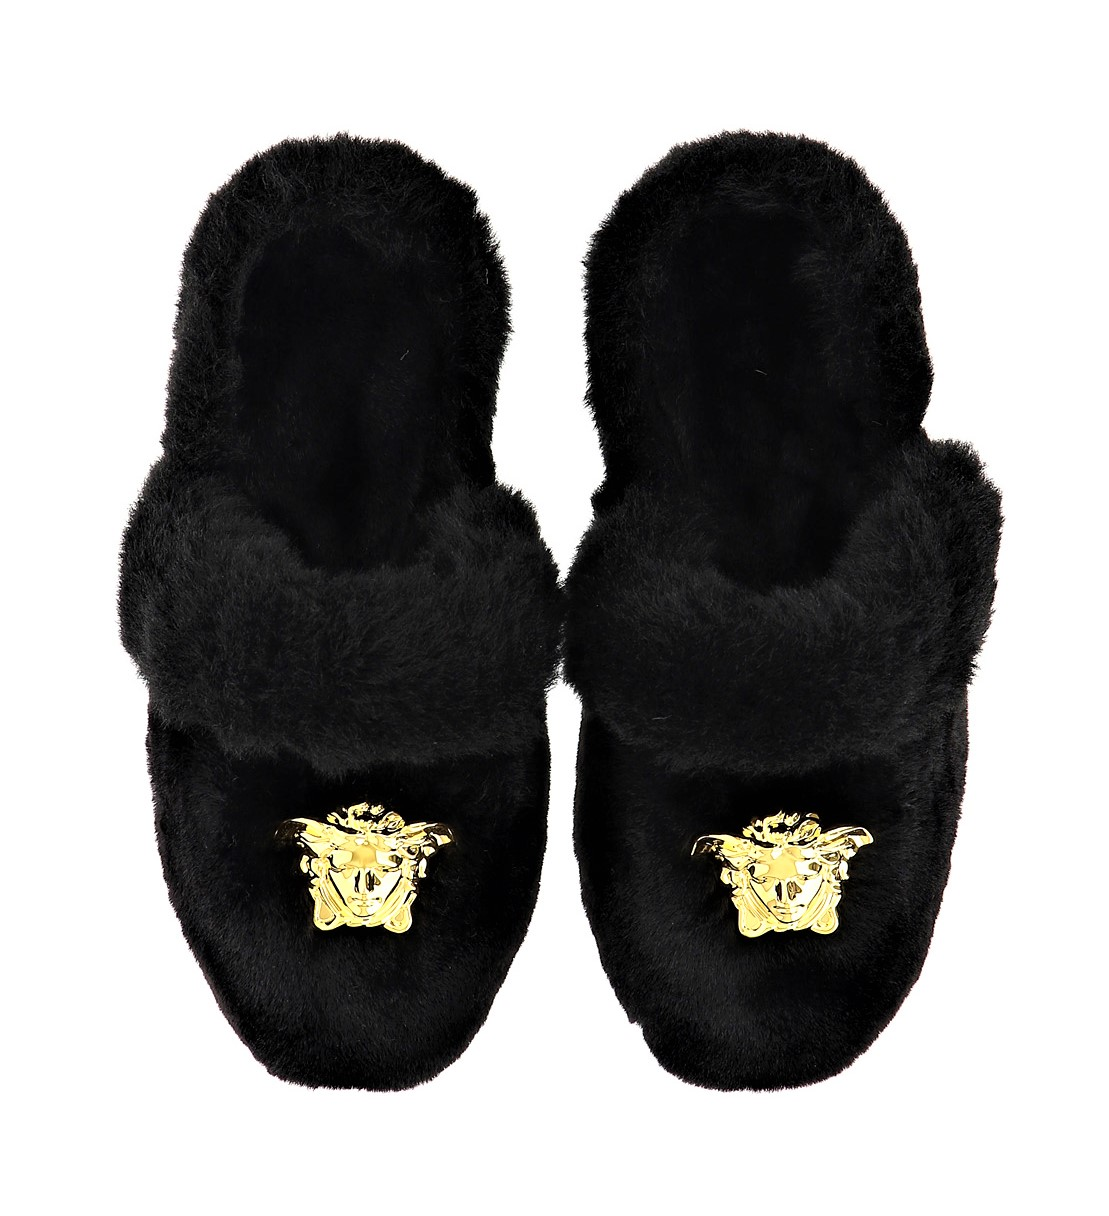 VERSACE Faux Fur Slippers Gold Medusa Black